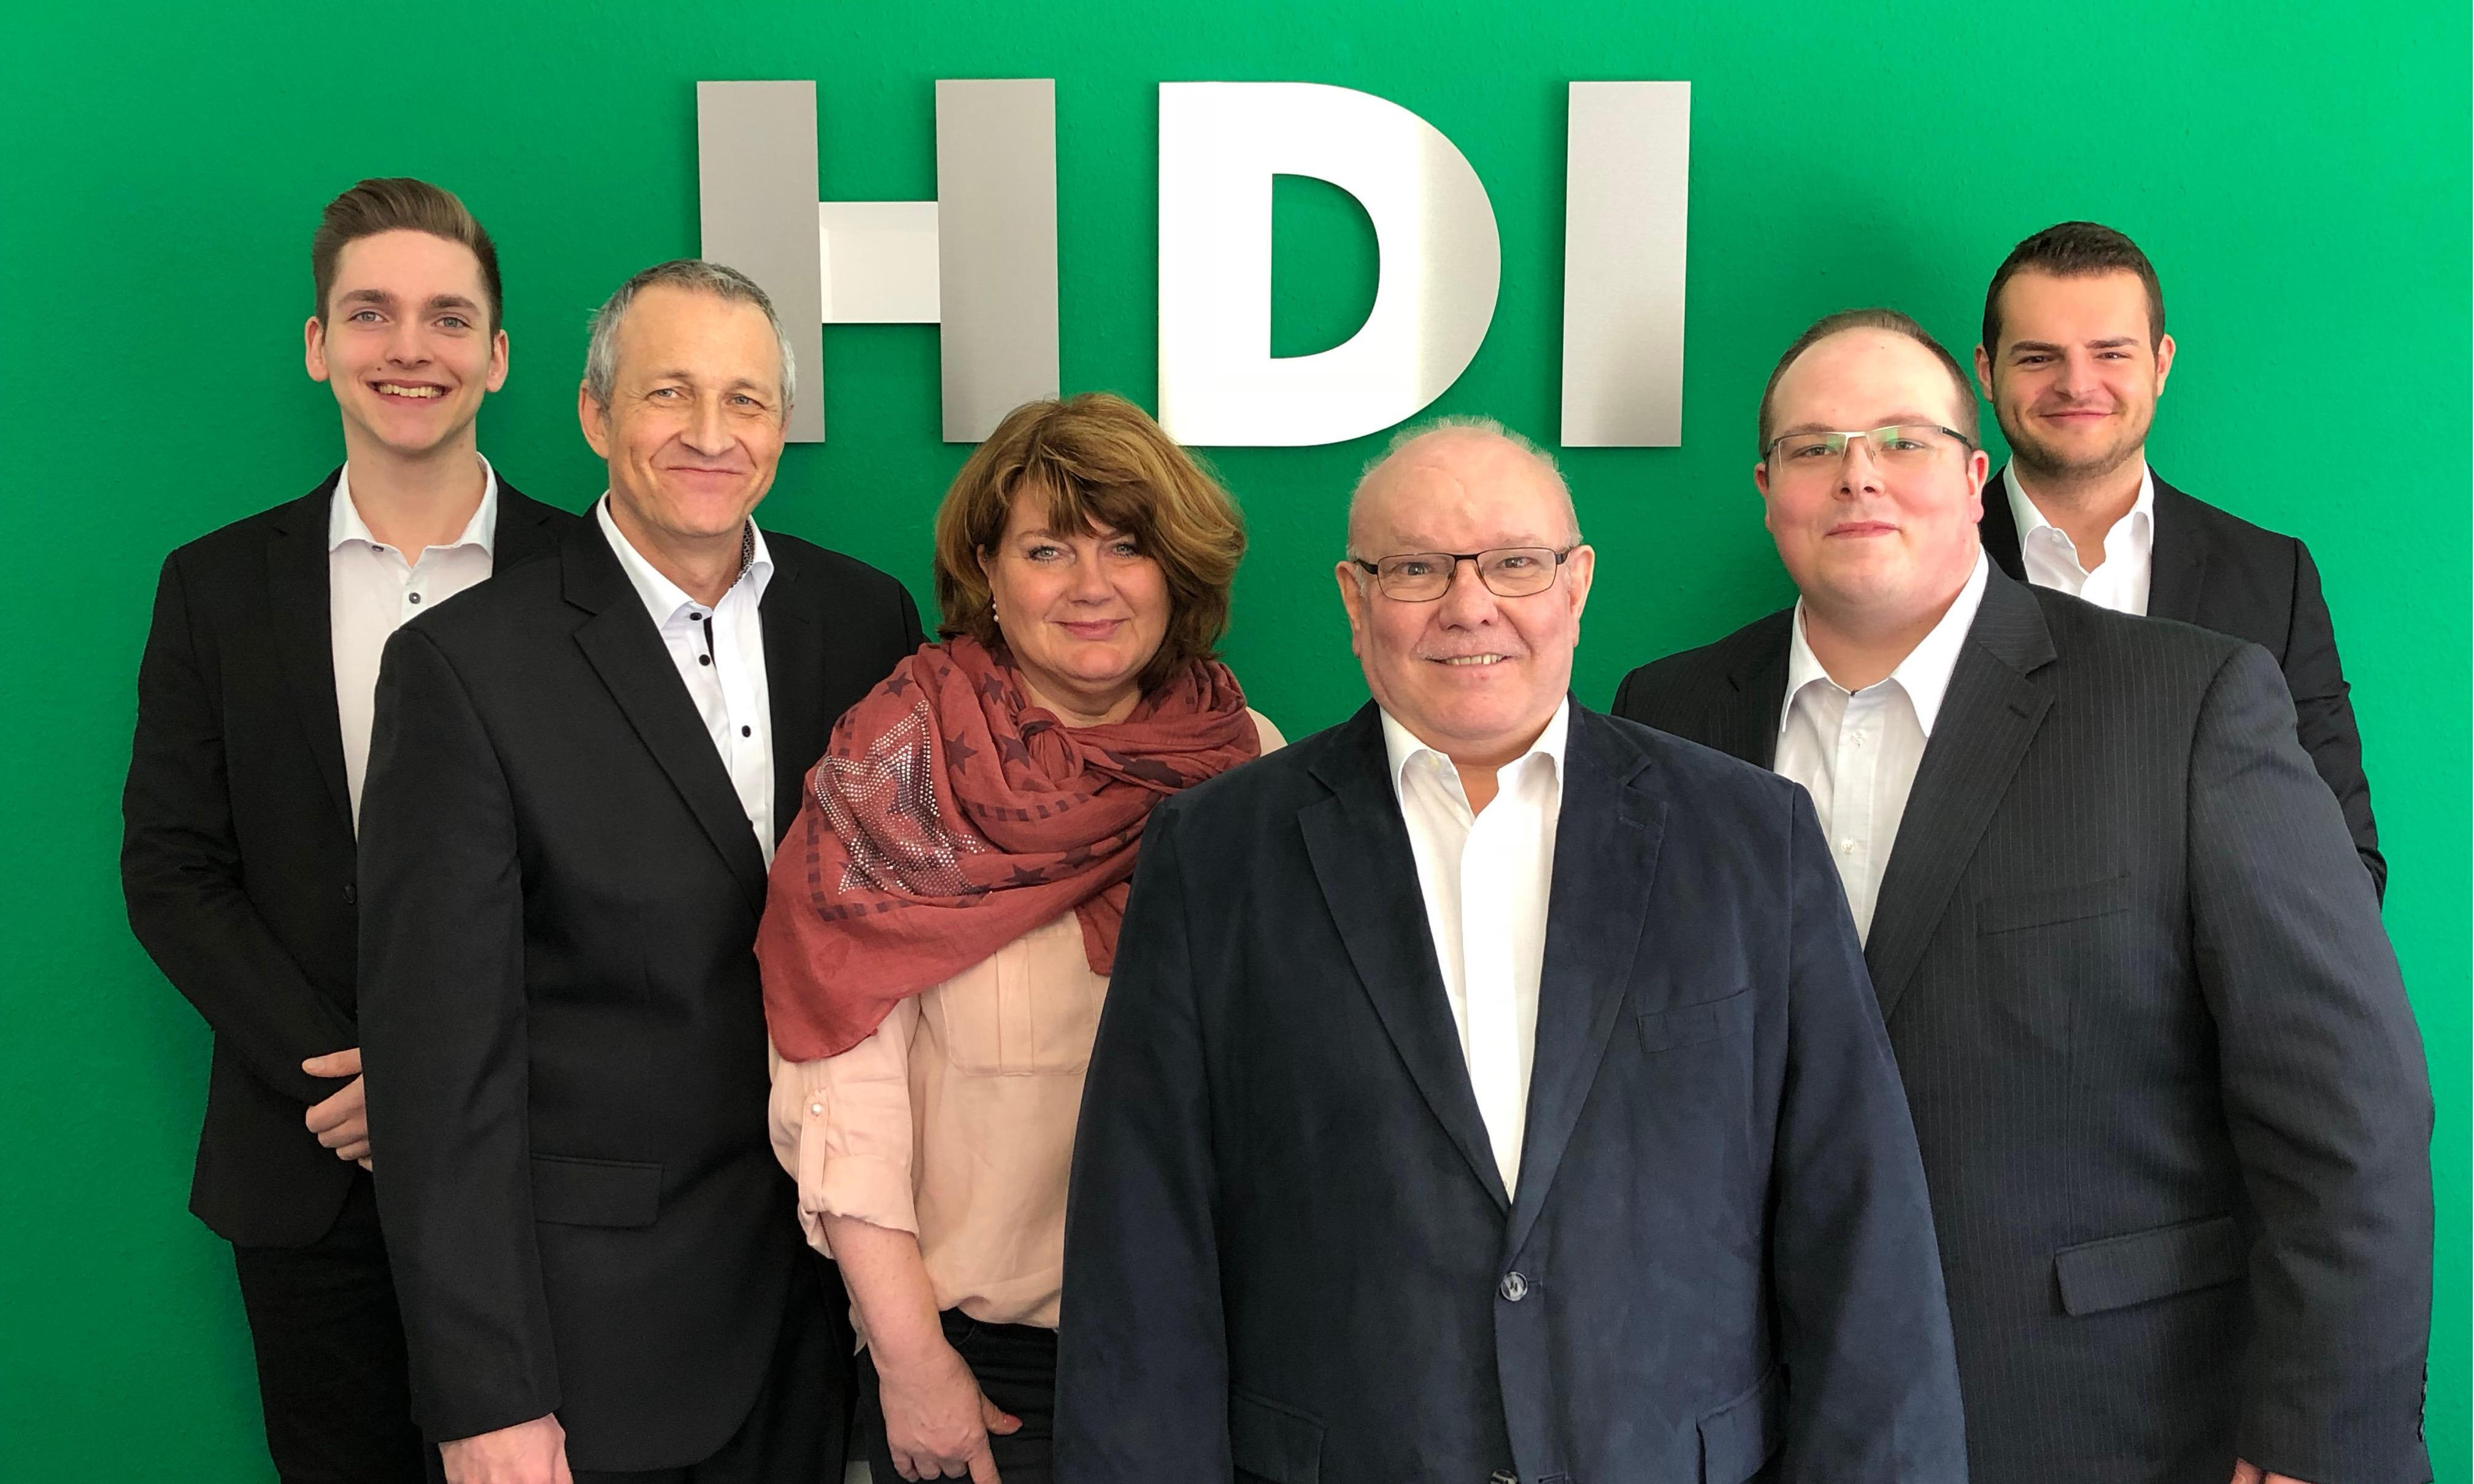 HDI Hauptvertretung Bernd Puckaß - Team